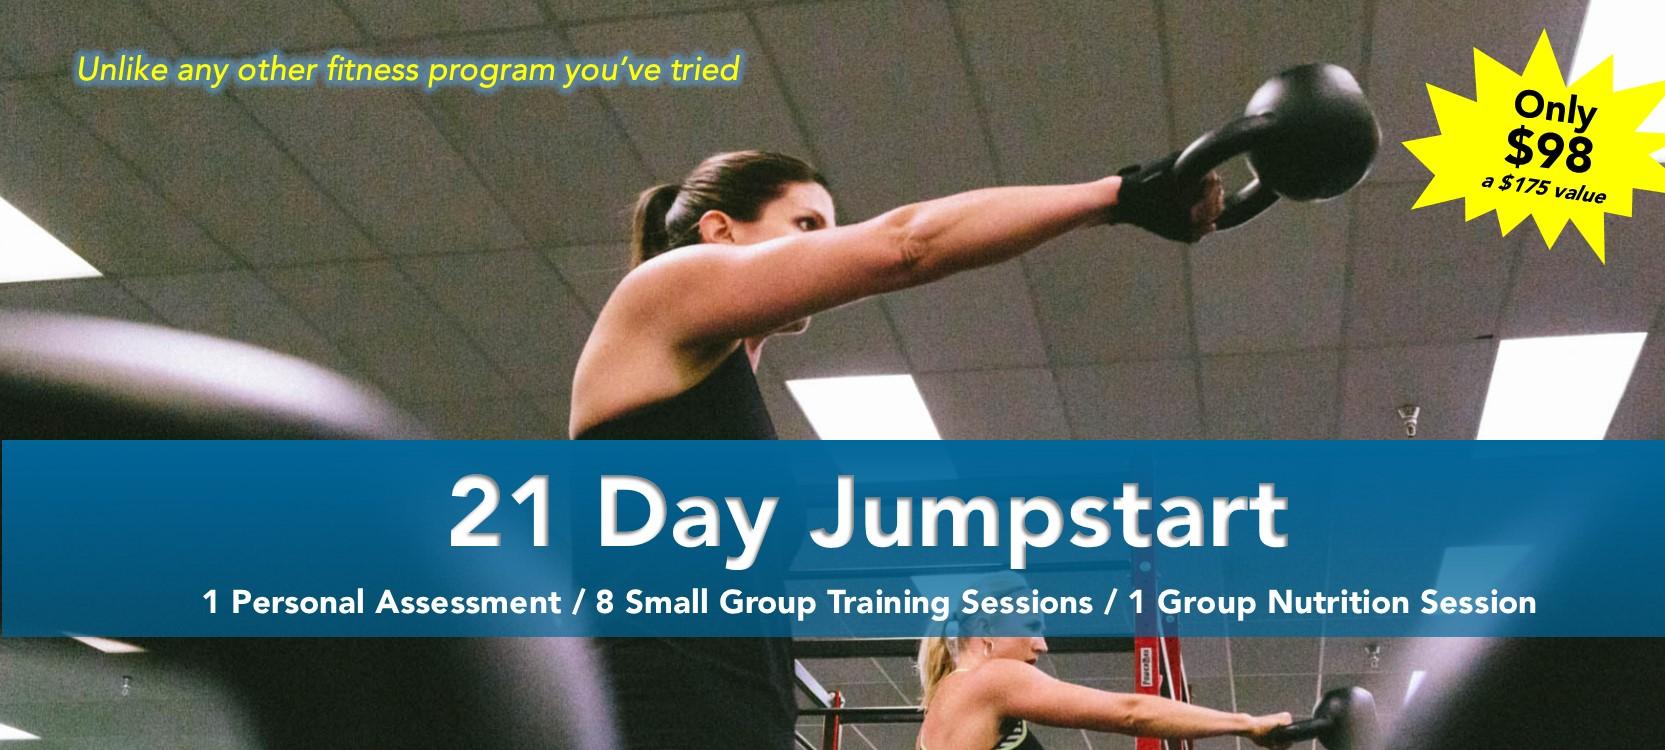 21 Day Jumpstart Banner Image.jpg